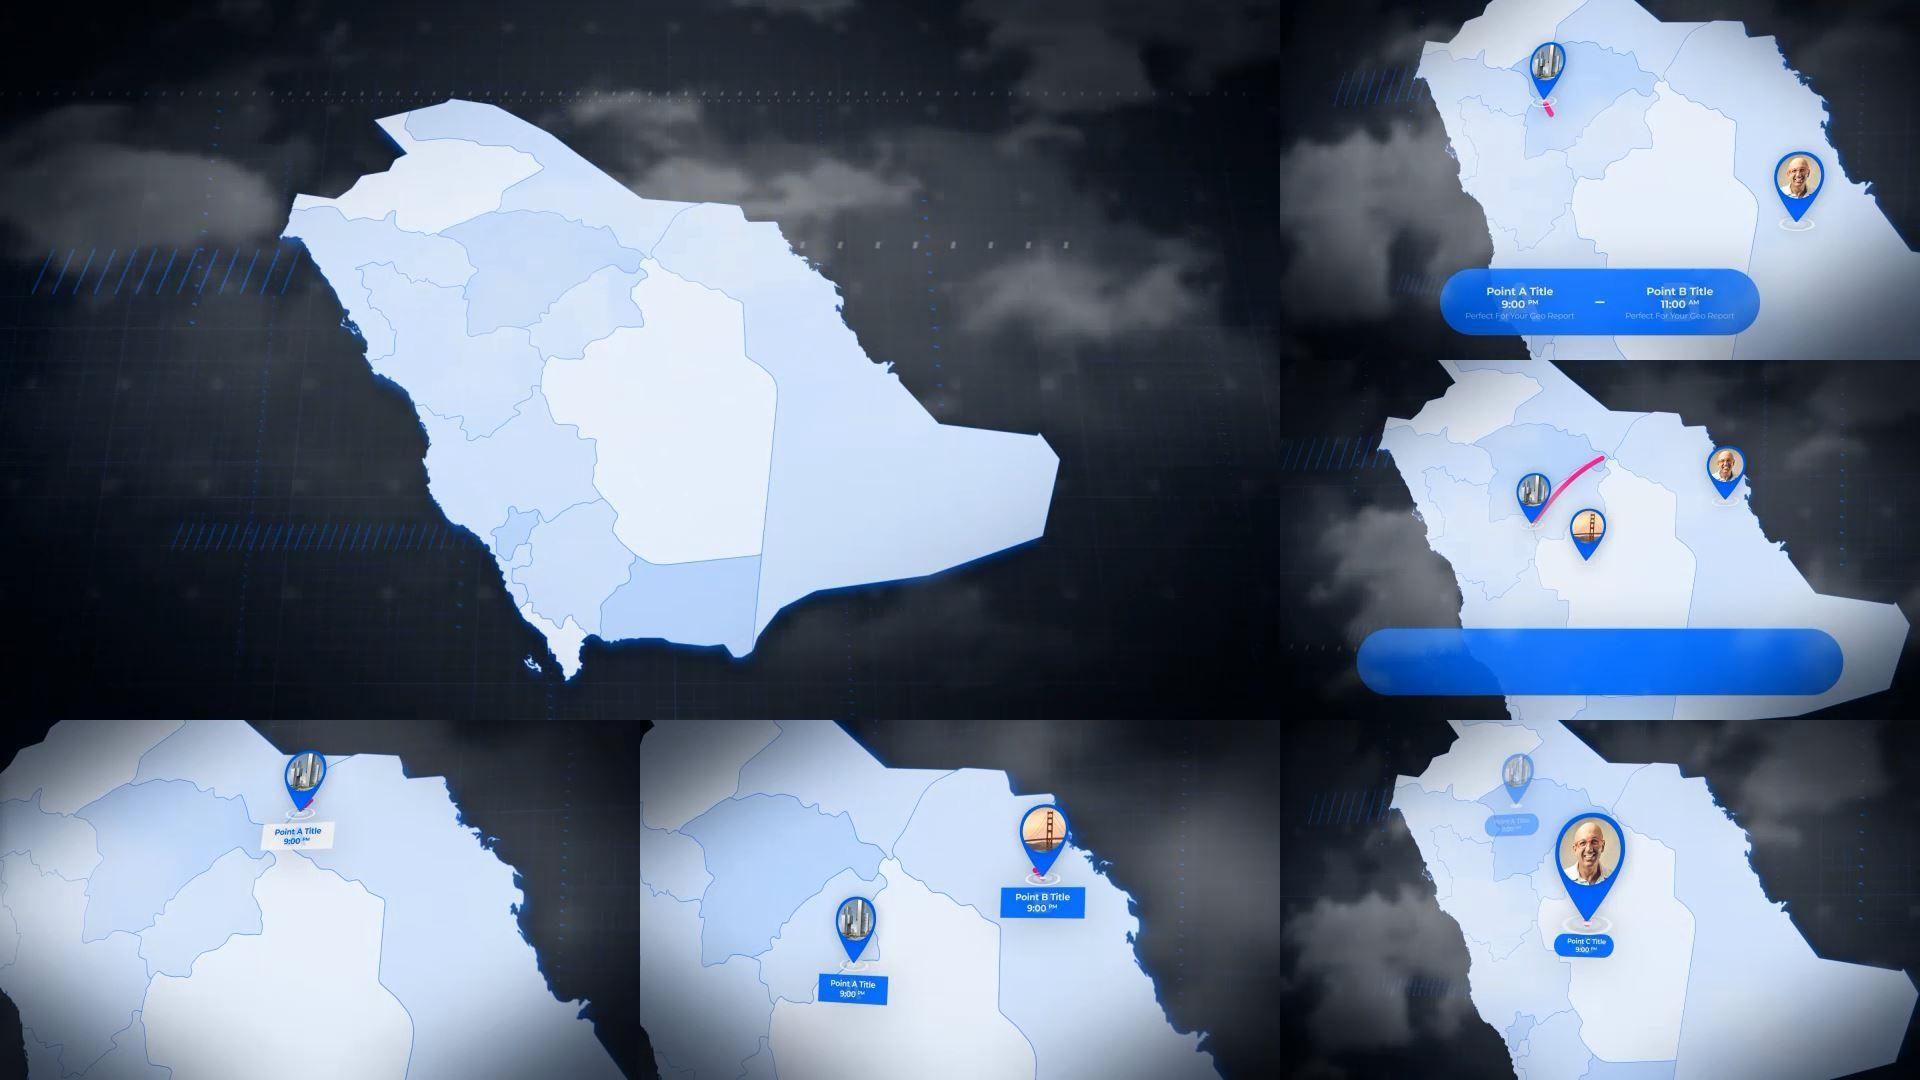 Saudi Arabia Map Kingdom Of Saudi Arabia Map Kit Box Art Icon Set Vector Map